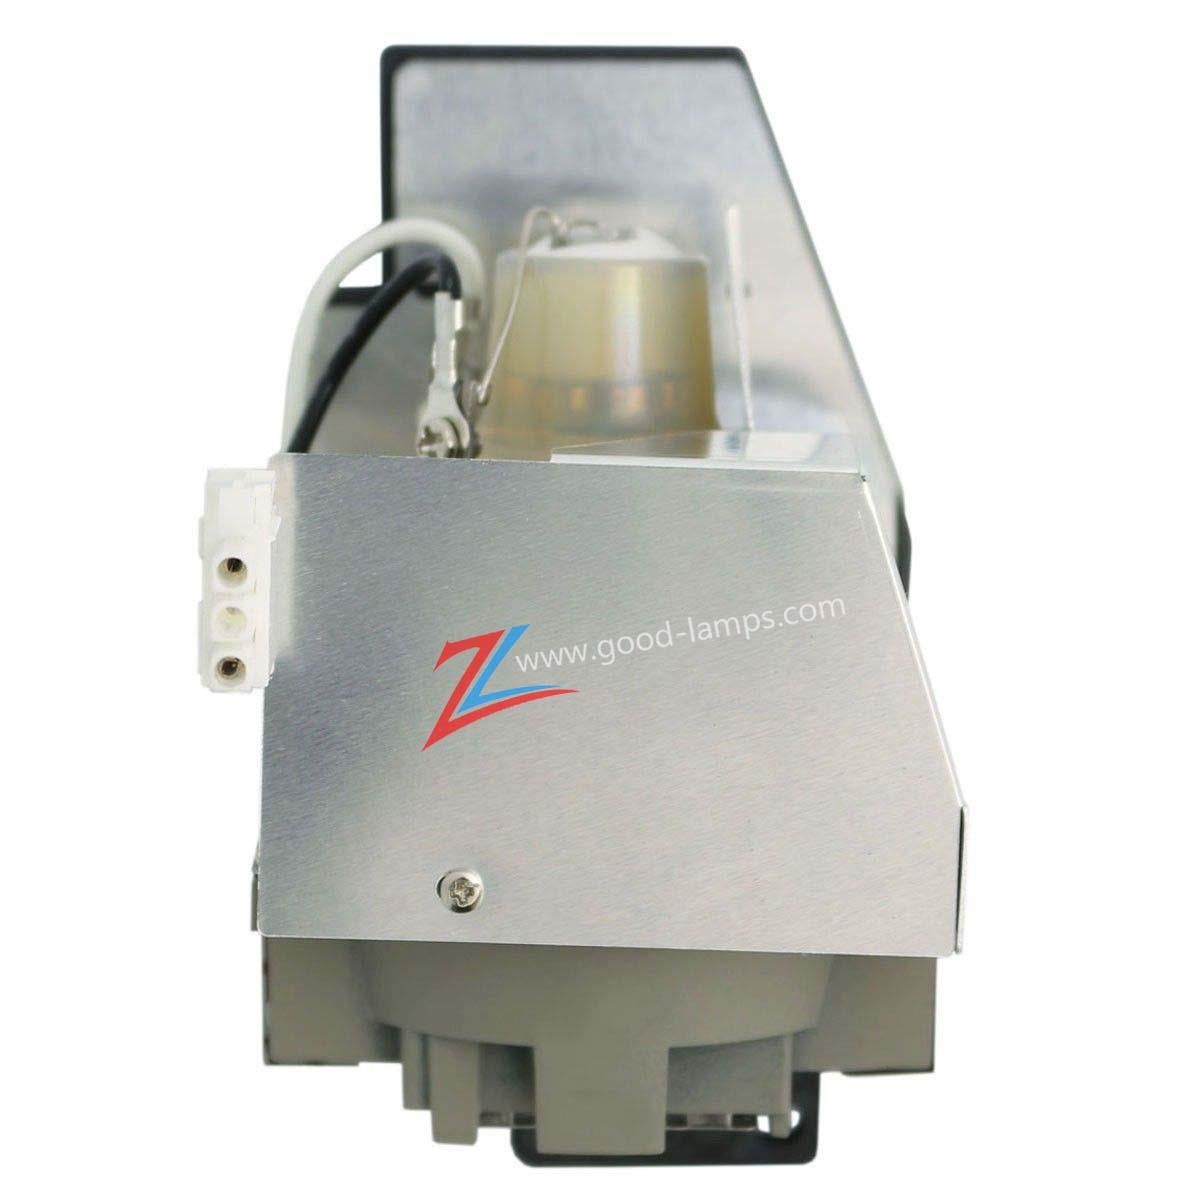 5J.J6N05.001 for Benq MP670 W600 W600+ MP626 MP576